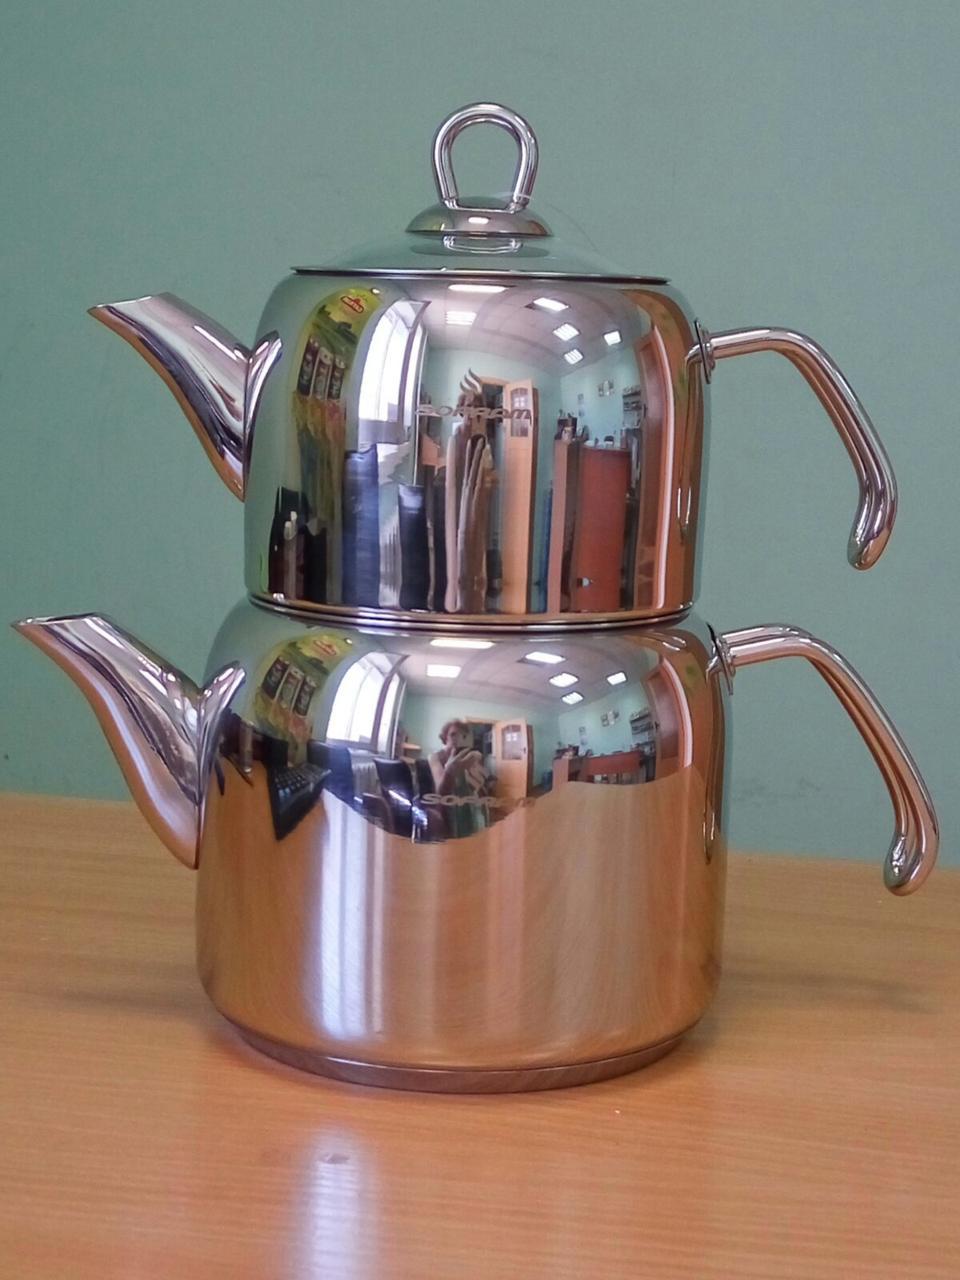 Турецкий чайник - Sofram (medium size) в коробке